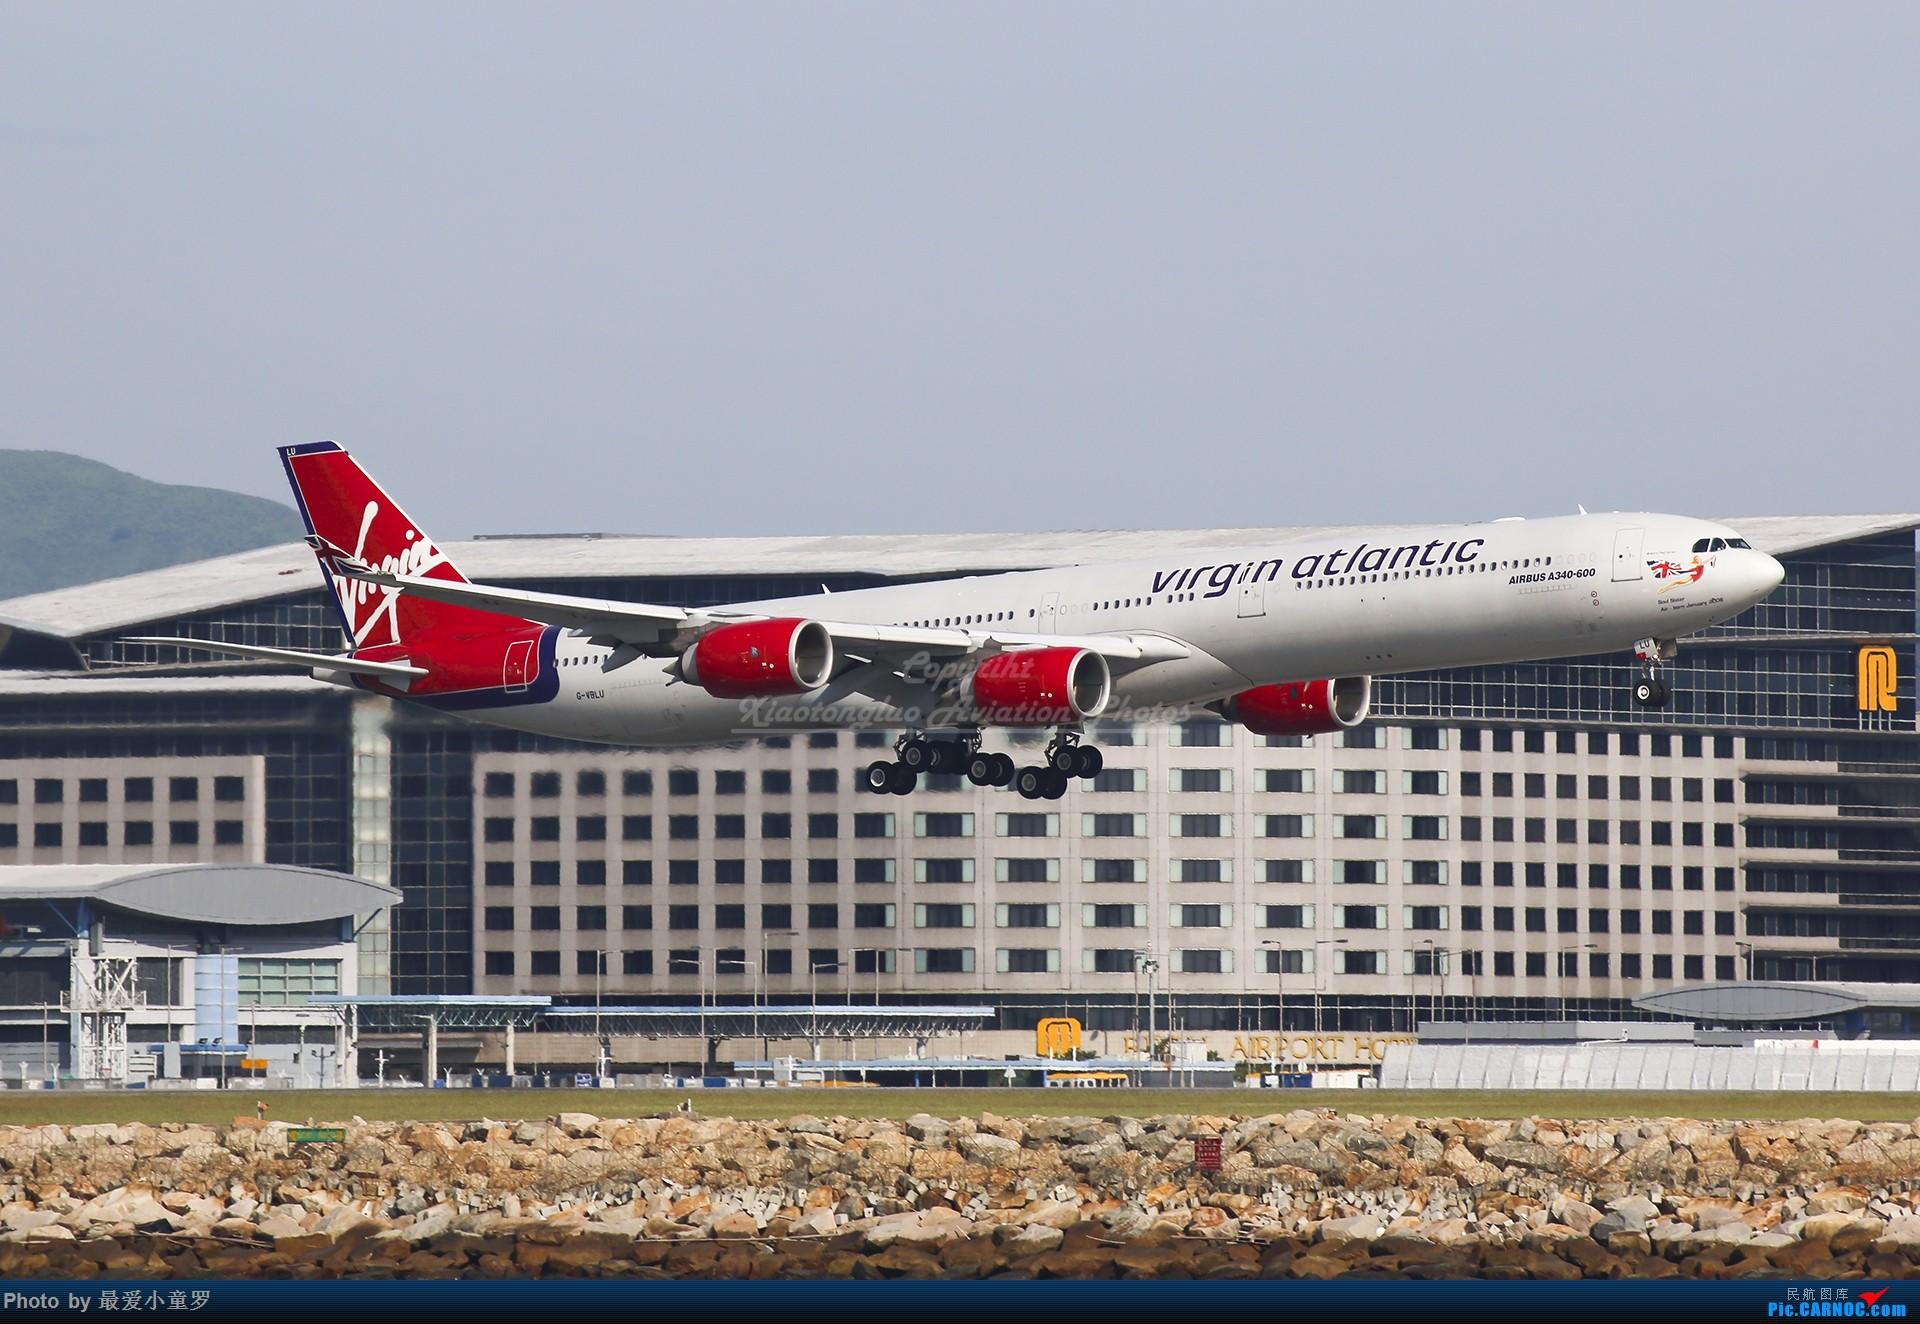 Re:[原创]2013-2018,系列组图纪念拍机5周年 AIRBUS A340-600 G-VMLU 中国香港国际机场